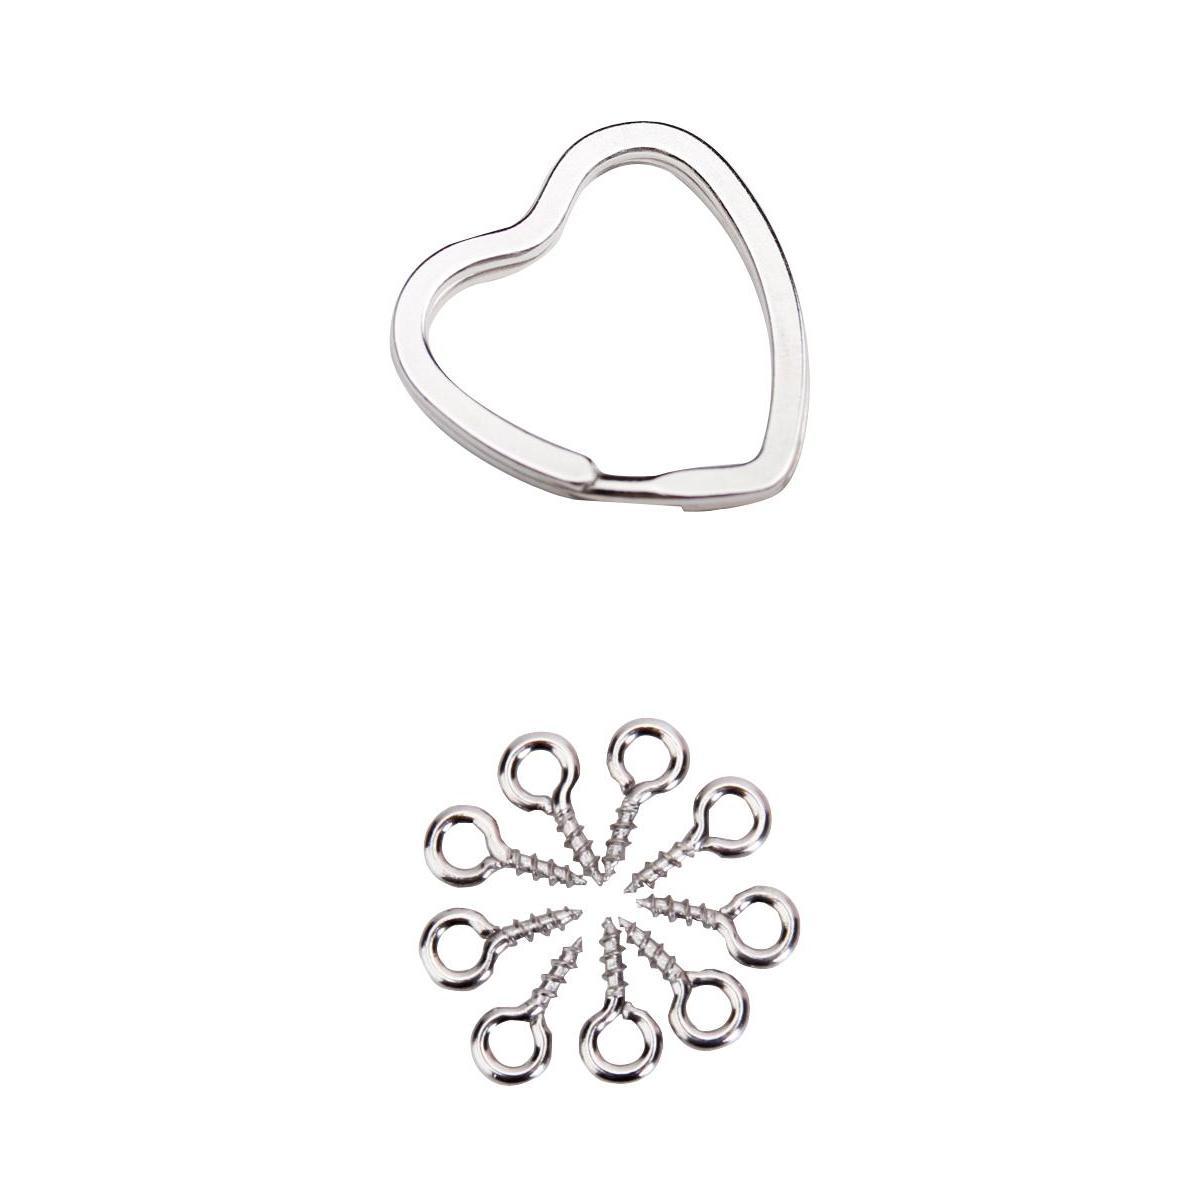 100pcs Silver Plated Eye Pin w/4mm Screw Peg+20pcs Heart Shaped Split Key Ring